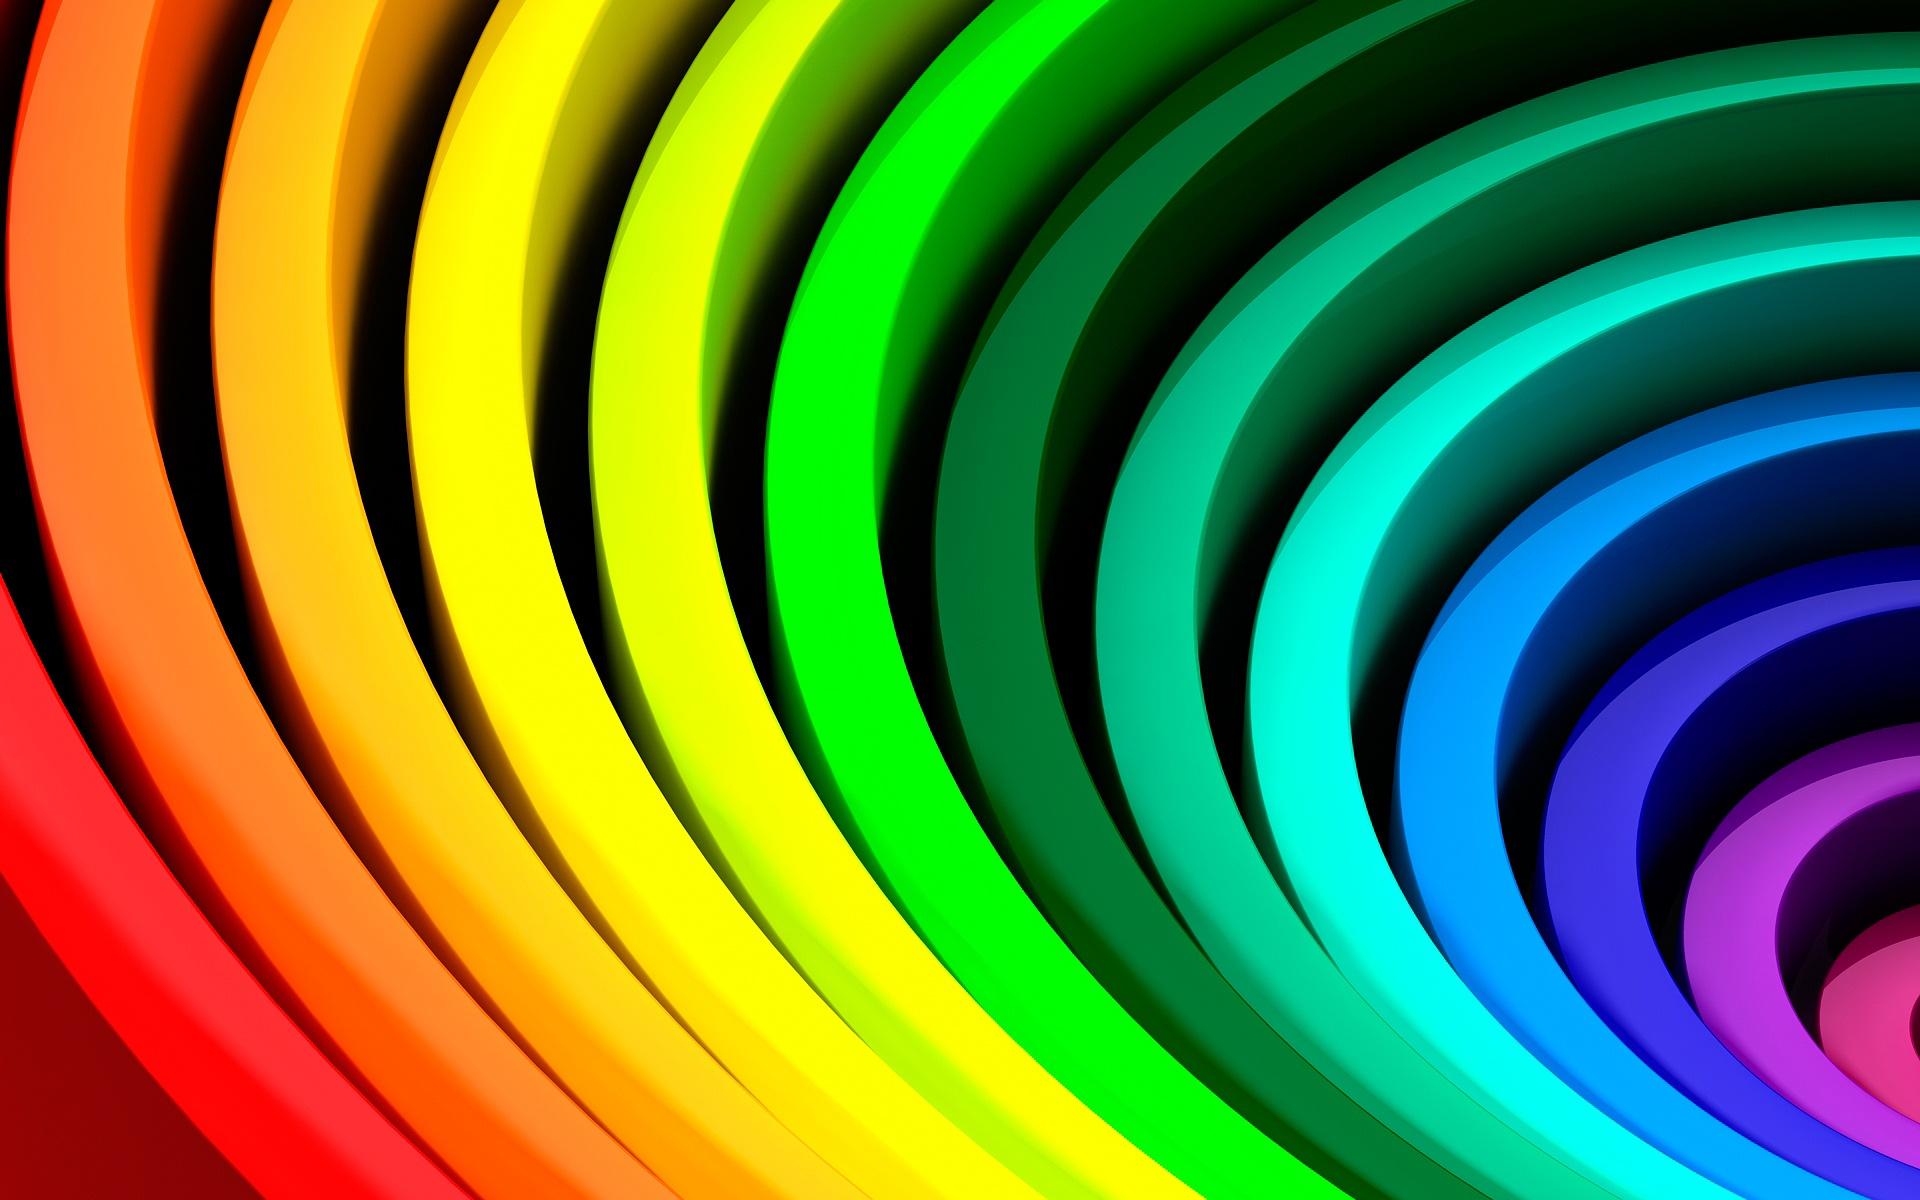 Abstrakte farbmuster 1920x1200 hd hintergrundbilder hd bild for Fondos de pantalla full hd colores